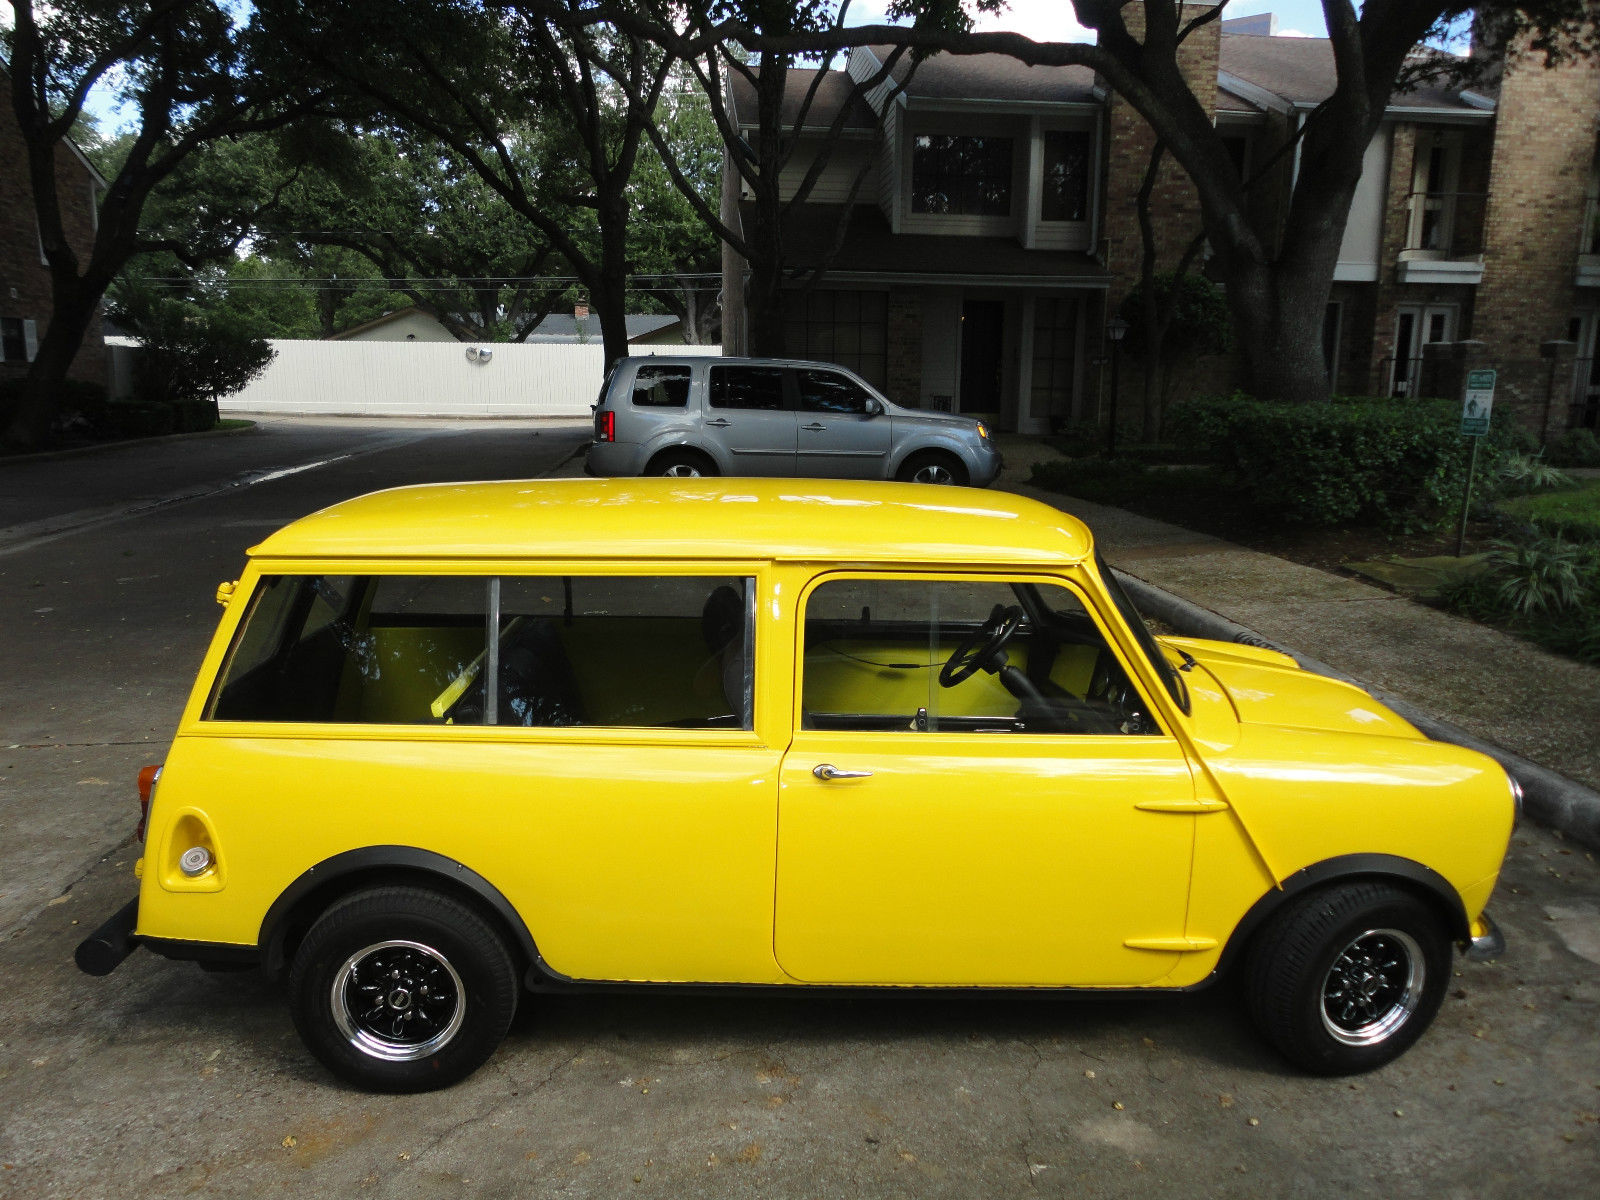 1966 austin mini countryman wagon for sale in houston texas united states. Black Bedroom Furniture Sets. Home Design Ideas